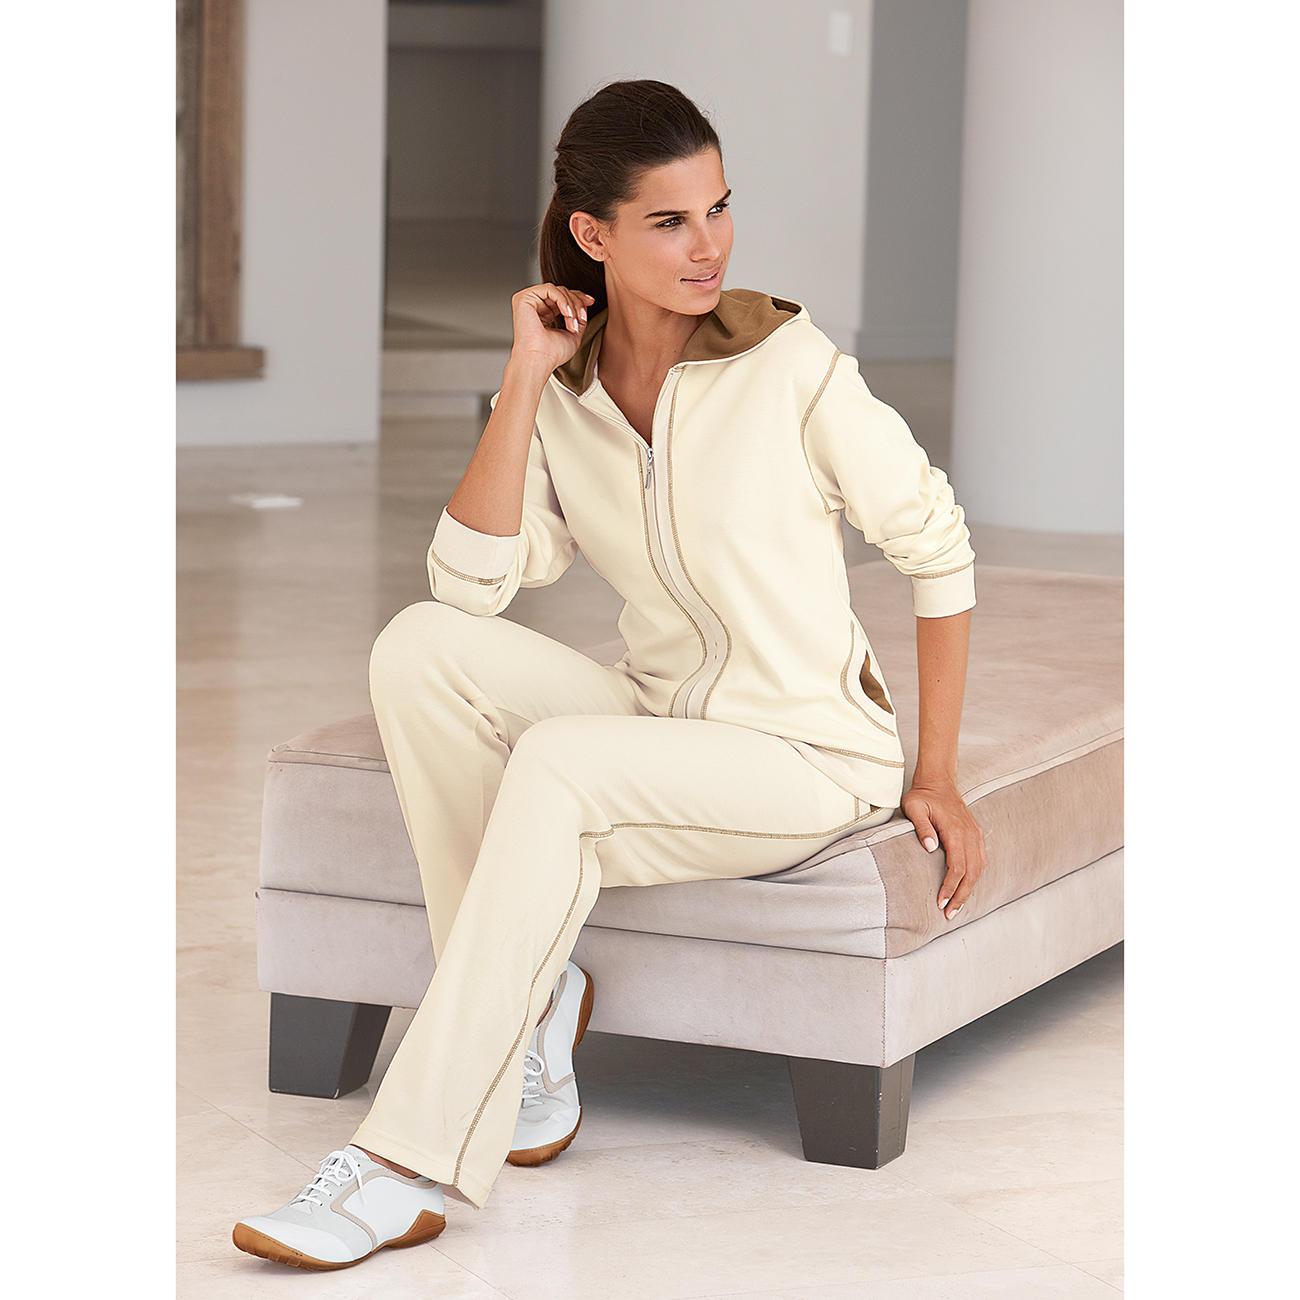 pima cotton anzug ecru cappuccino online kaufen. Black Bedroom Furniture Sets. Home Design Ideas